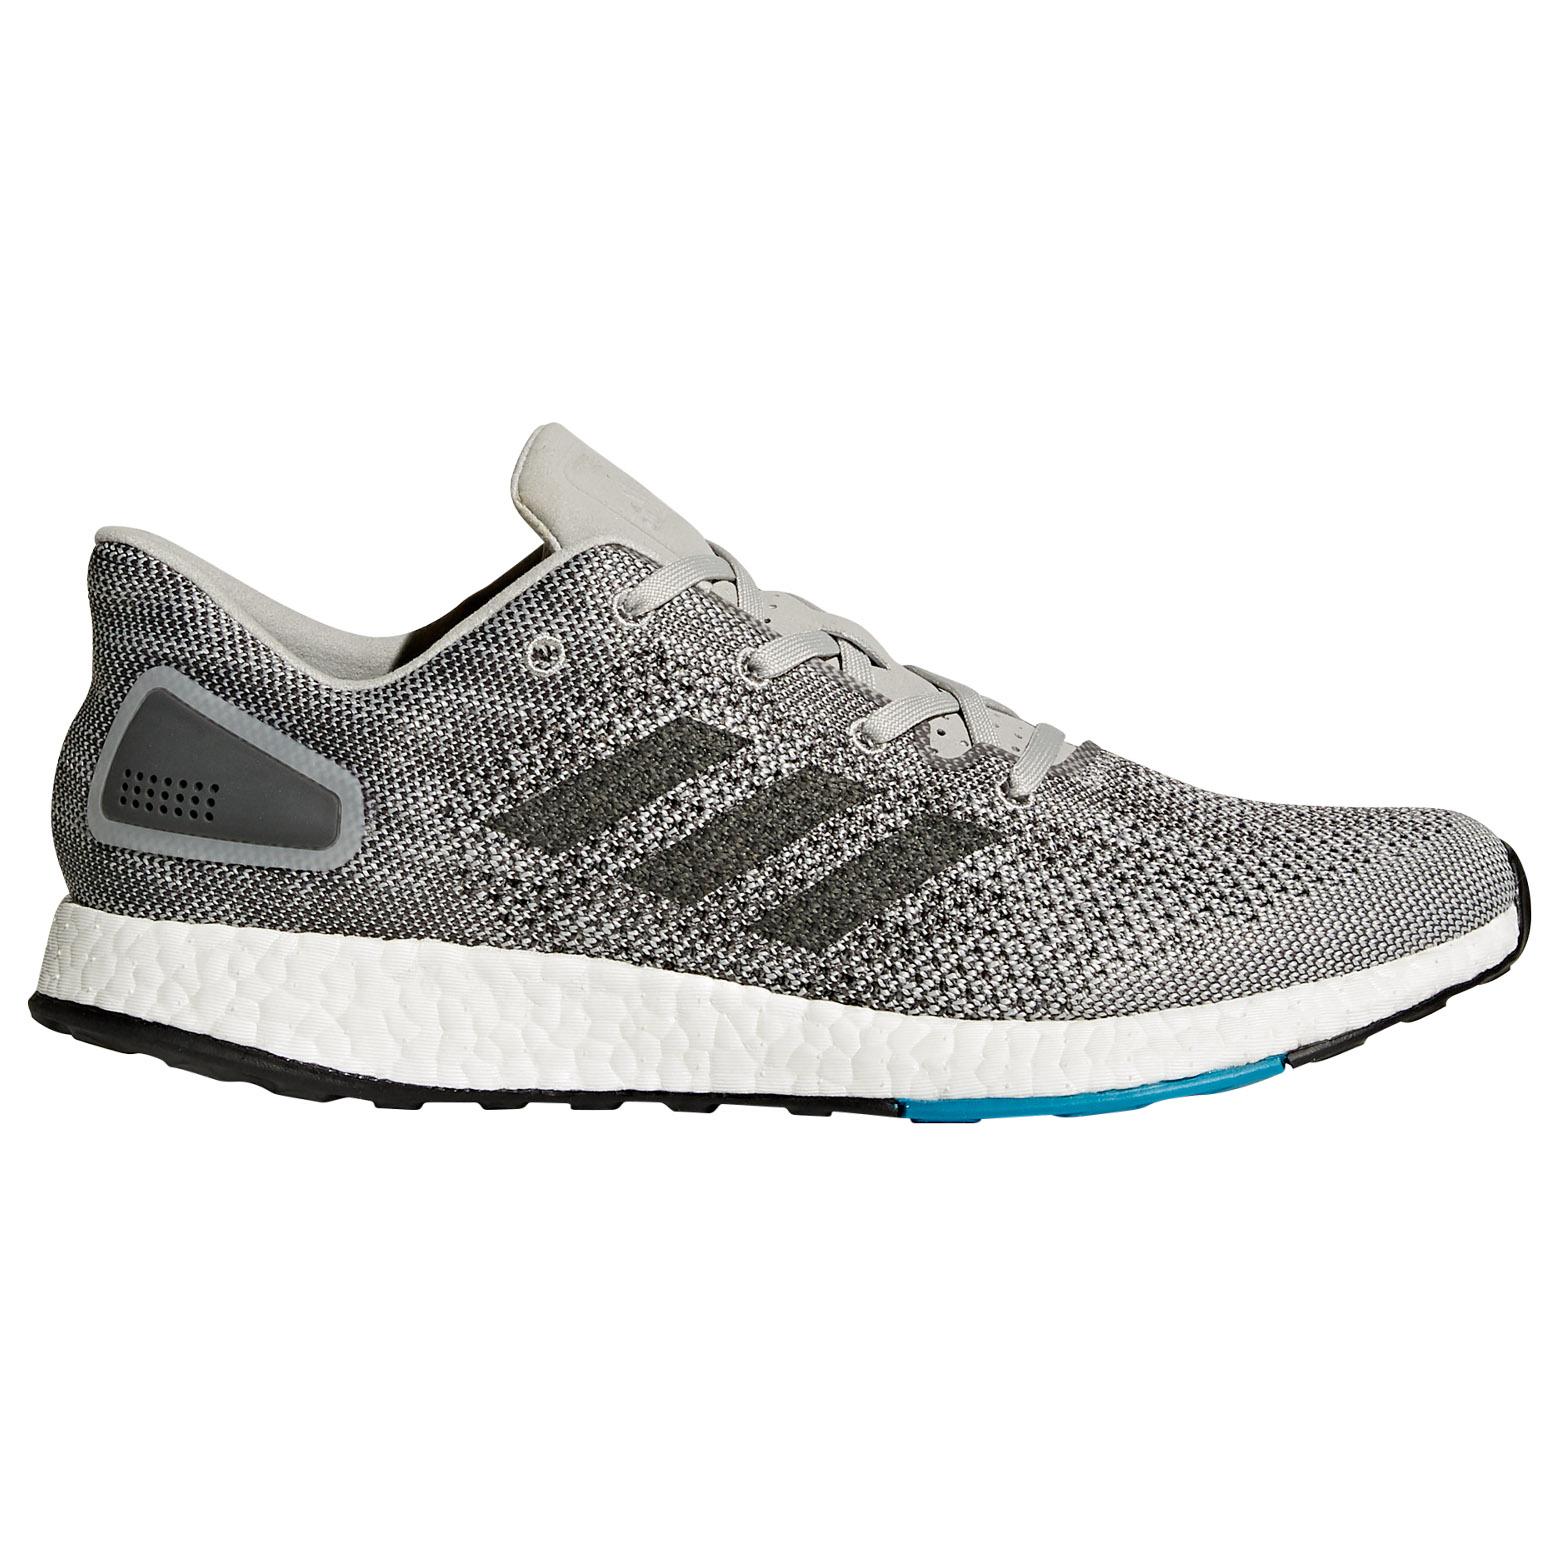 Adidas Pureboost remitidos Hombre Para Correr Fitness Gris Entrenador Zapato Gris Fitness 05edd1